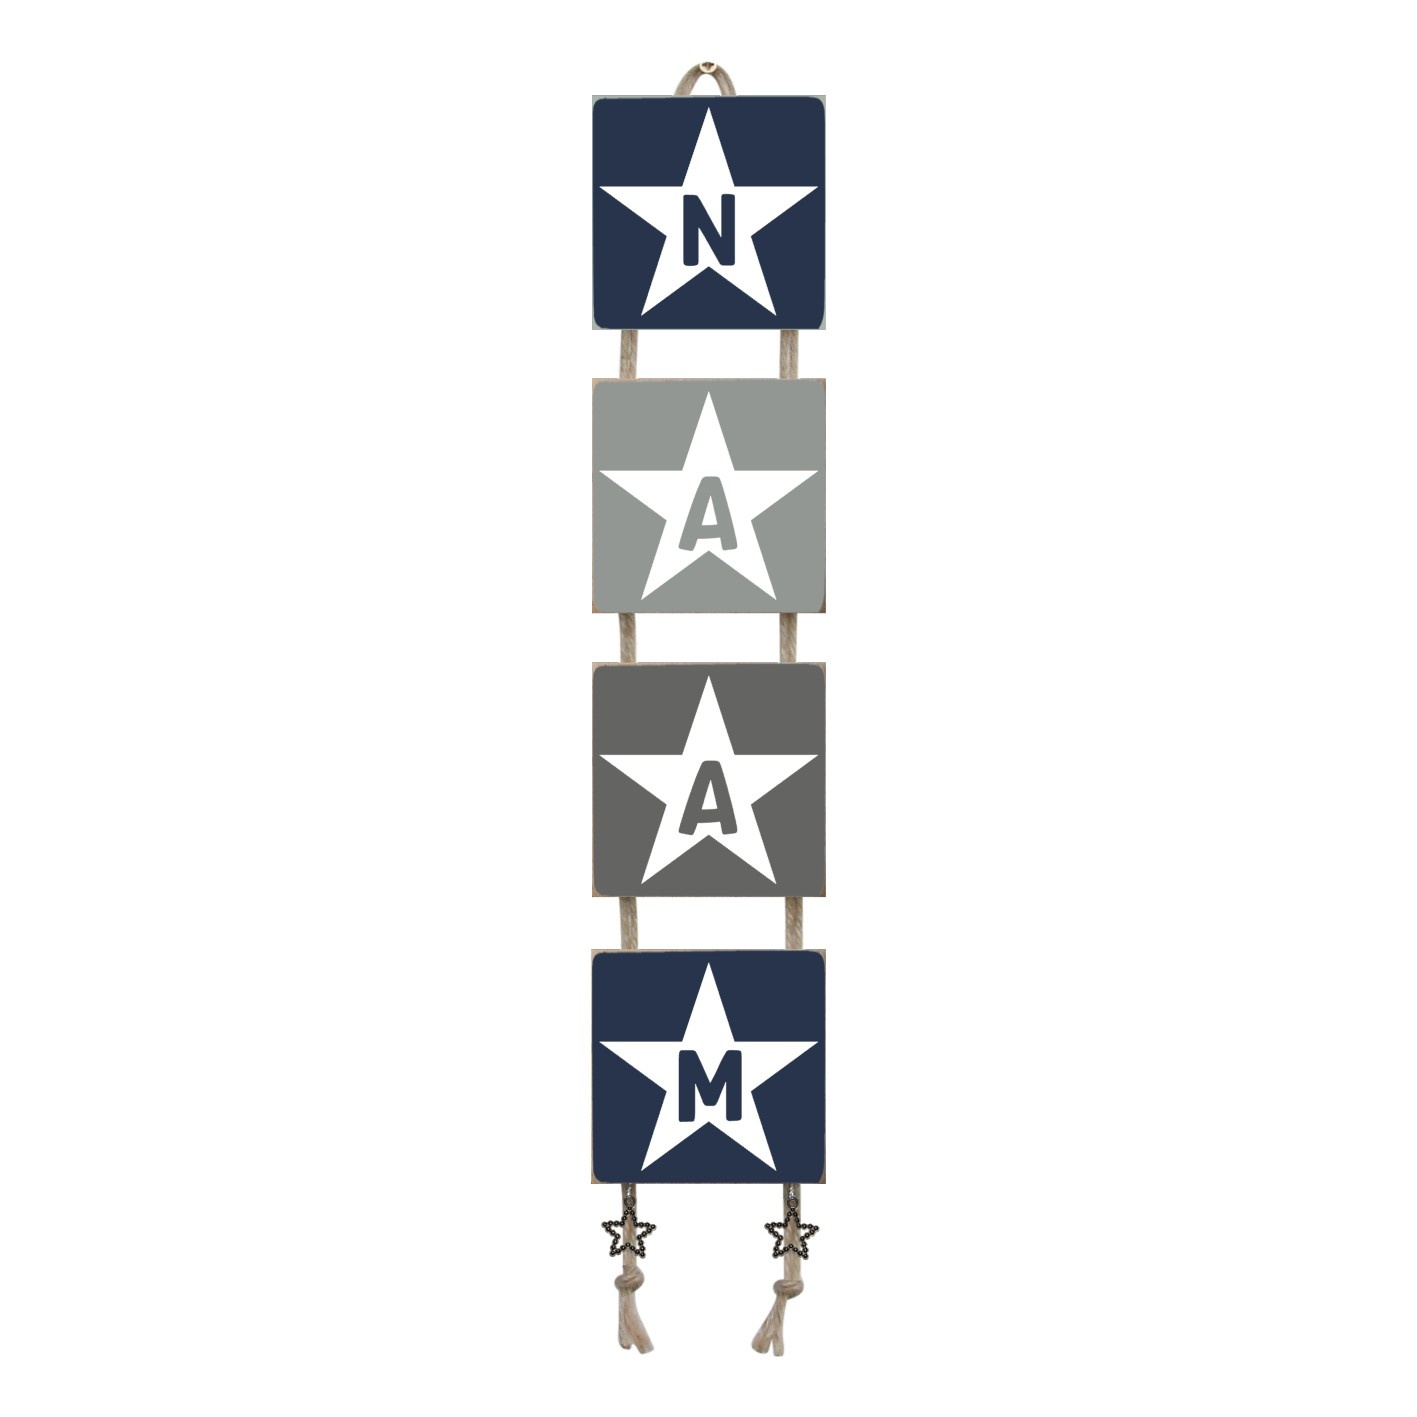 Naamladder donkerblauw/grijstinten ster